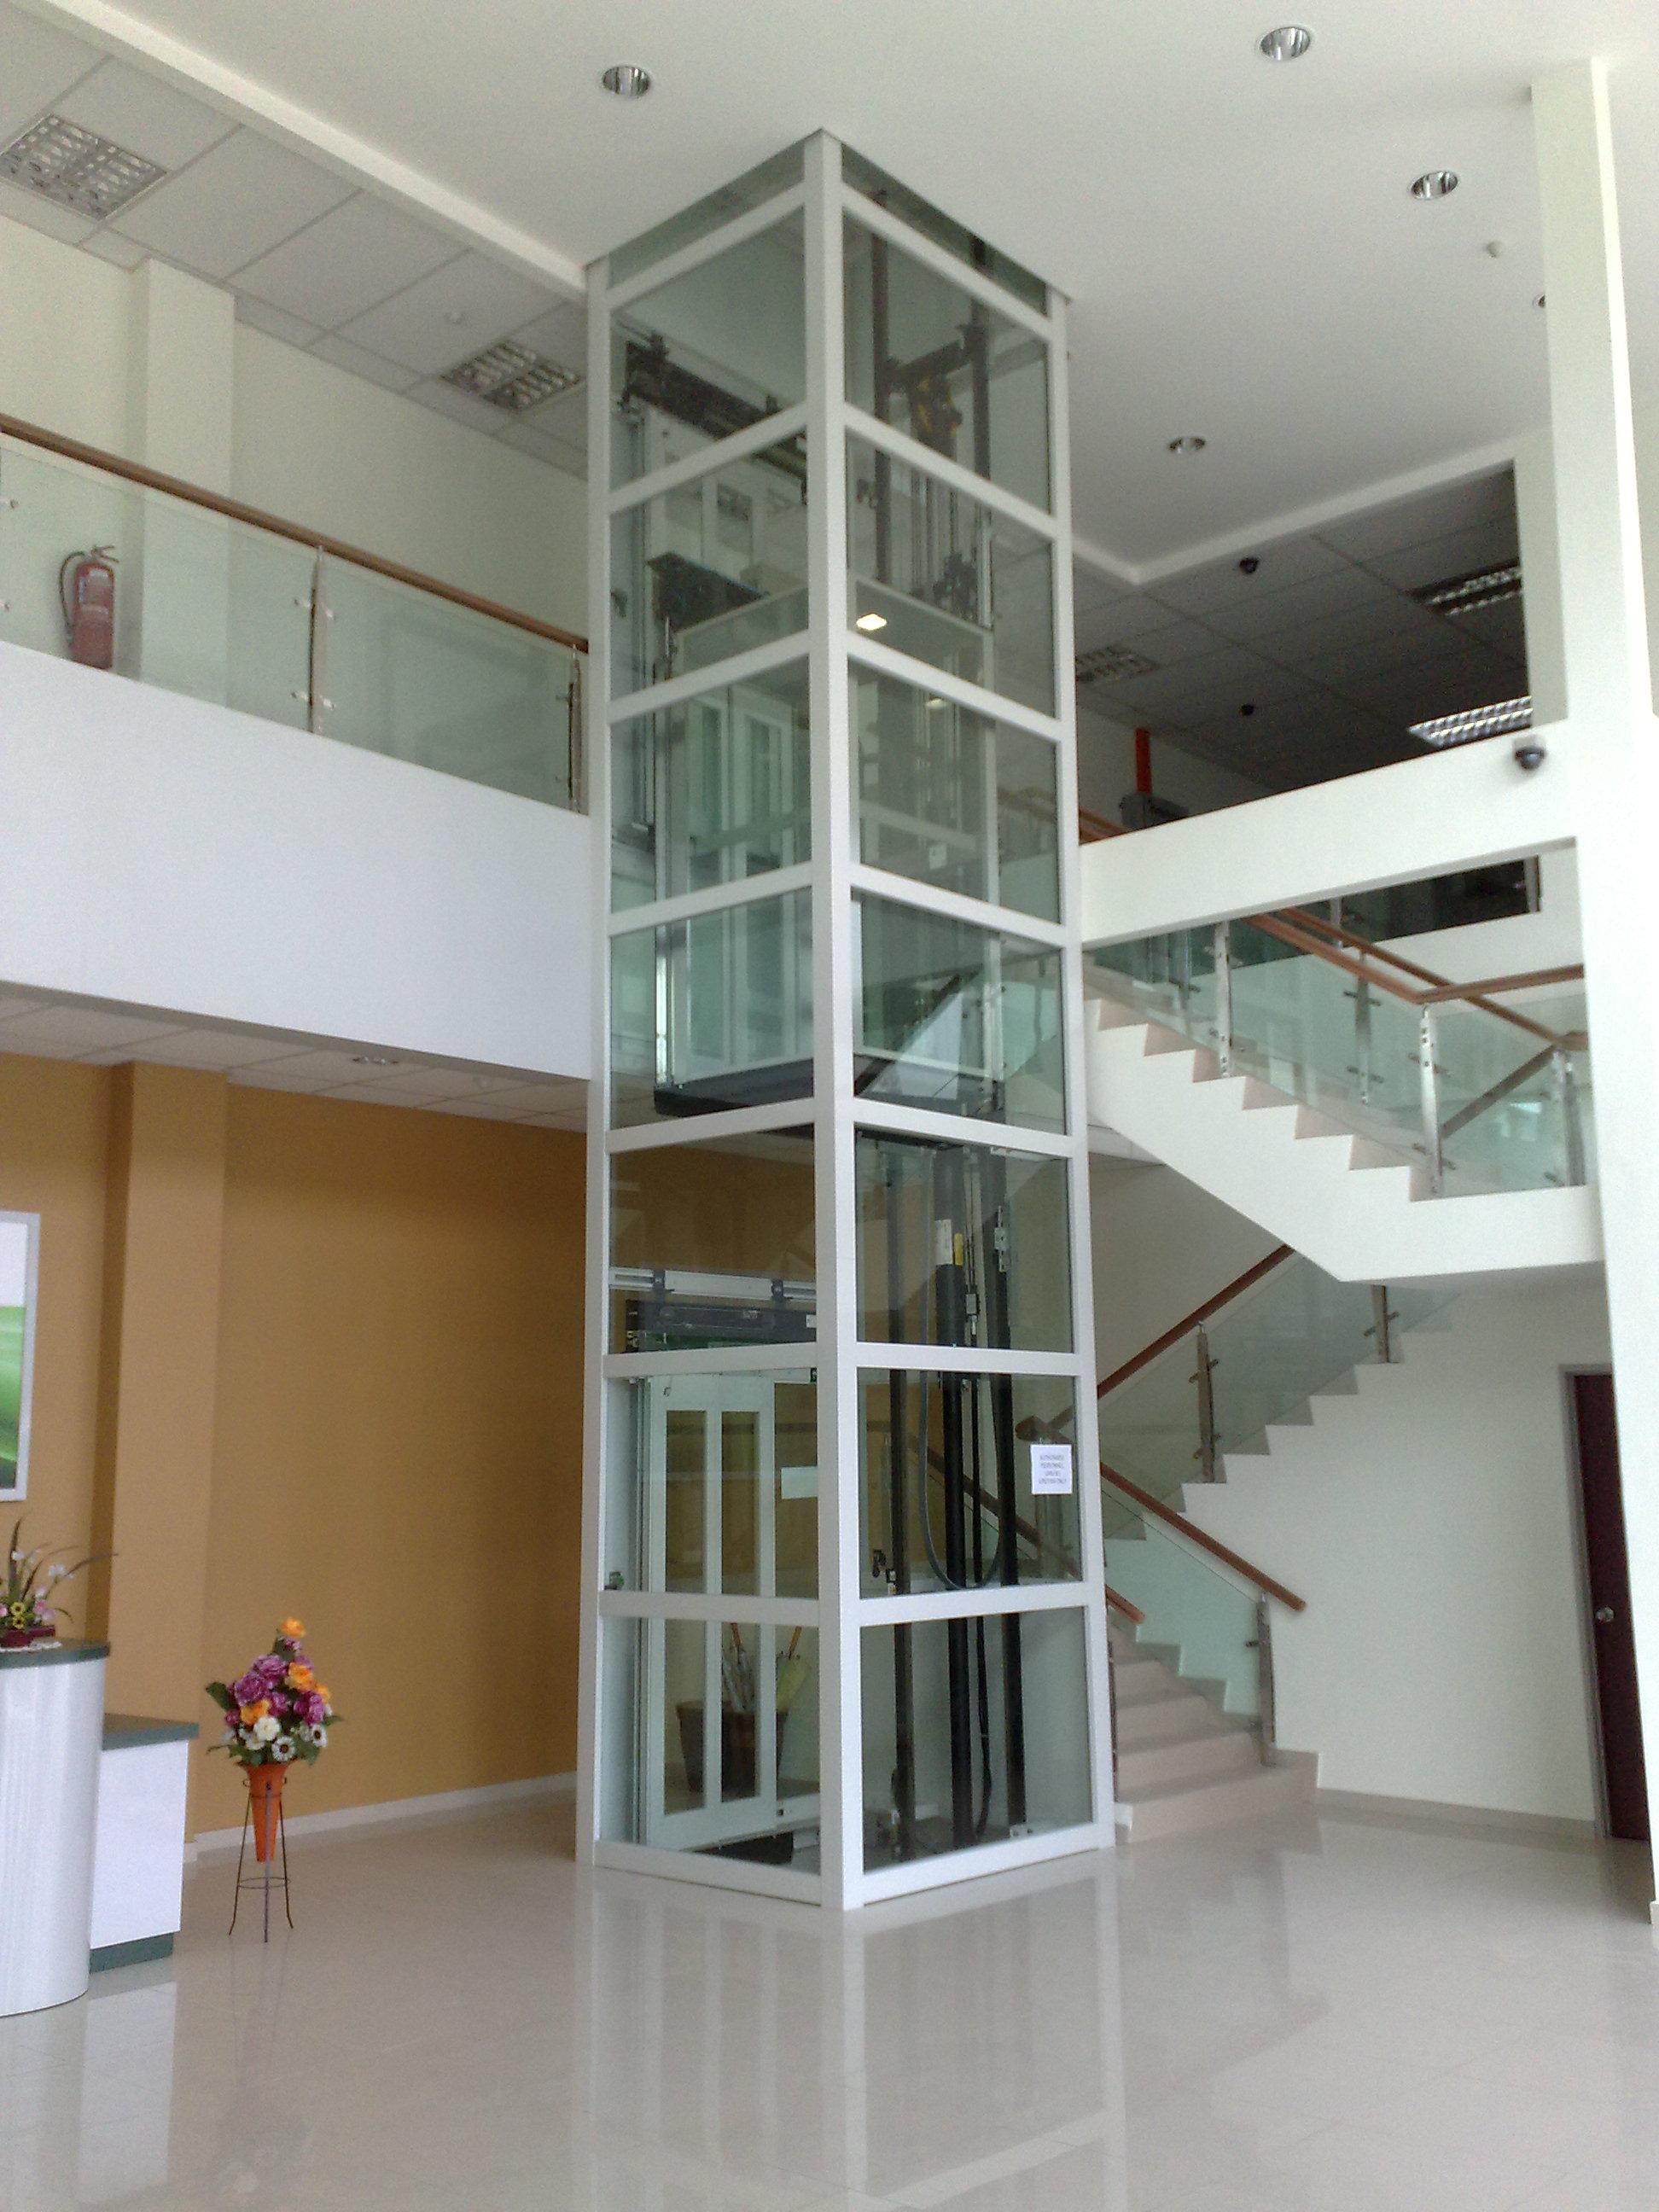 Home elevator dimensions - Elaboration Of Metal Structures Metal Shafts Of Elevators